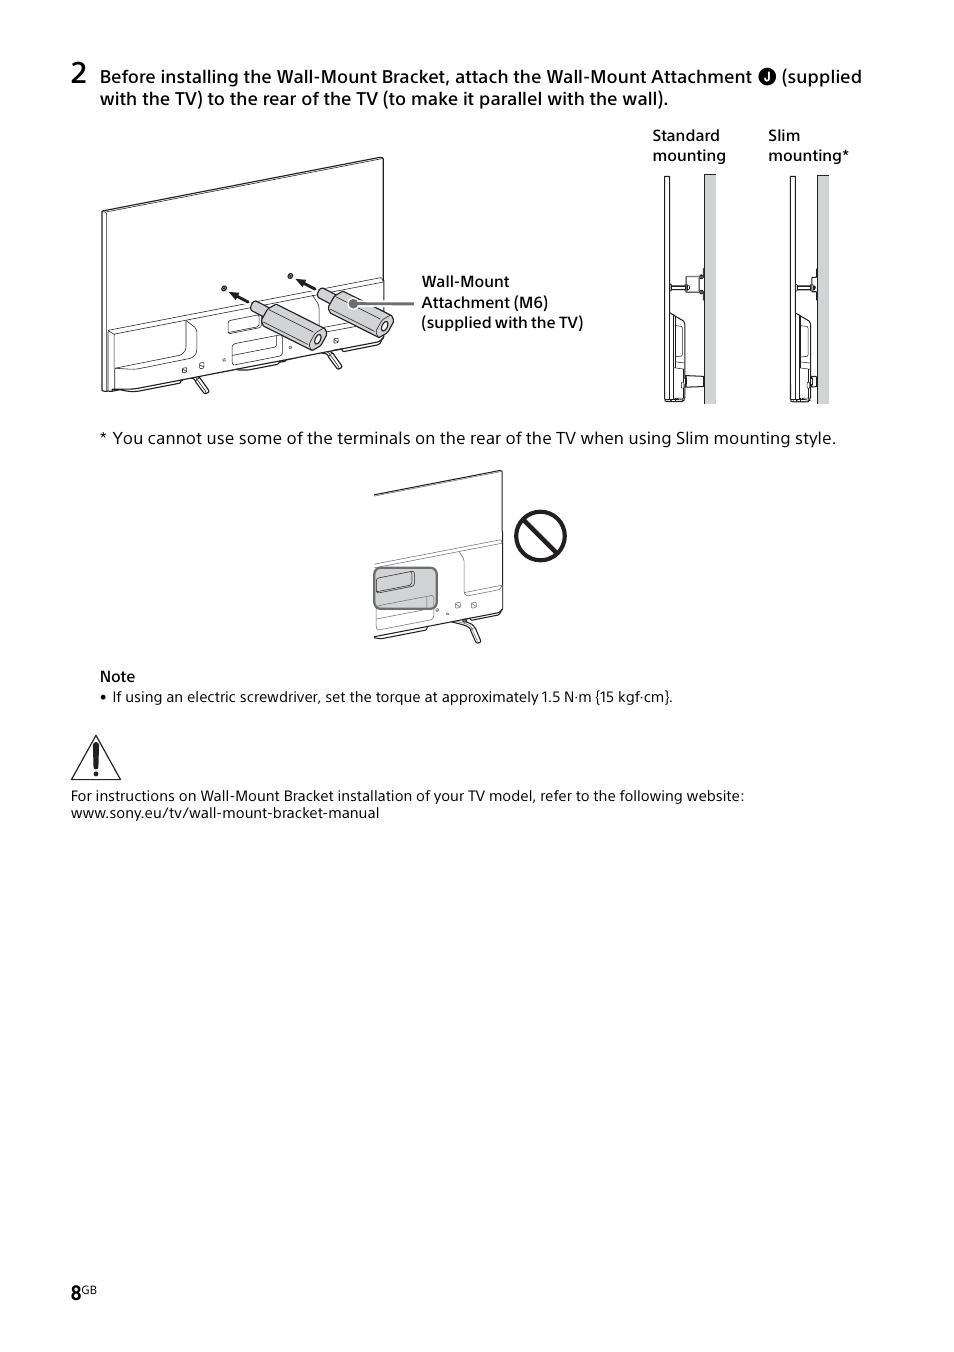 Sony Kdl 55w829b User Manual Page 8 256 Also For Kdl 55w805b